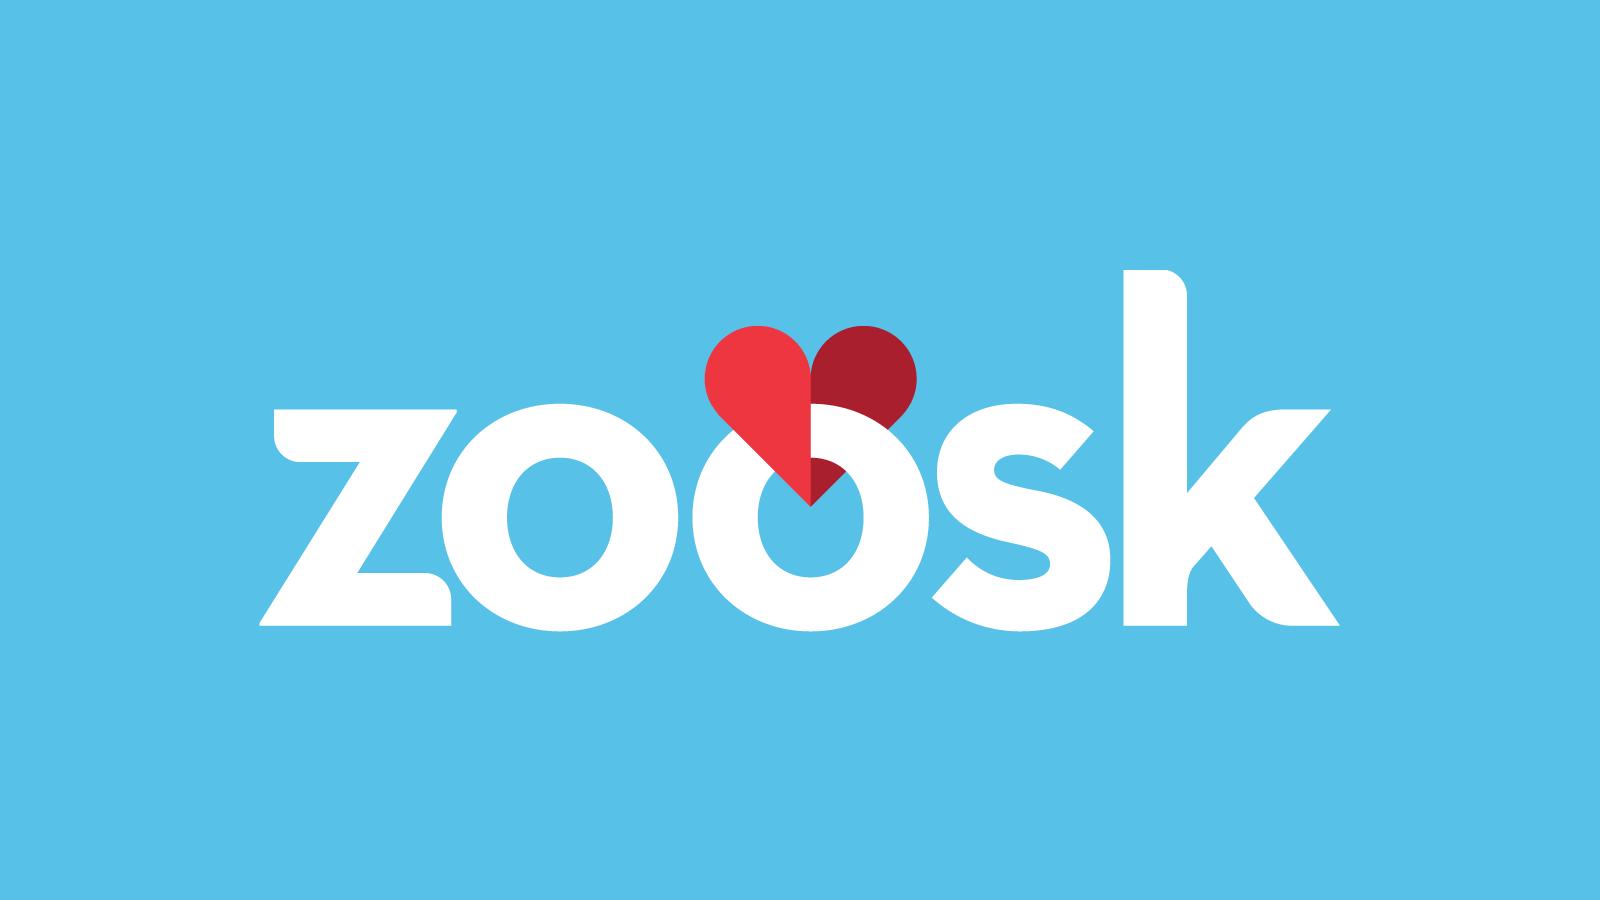 Zoosk dating site promo-code Evan dating coach blog